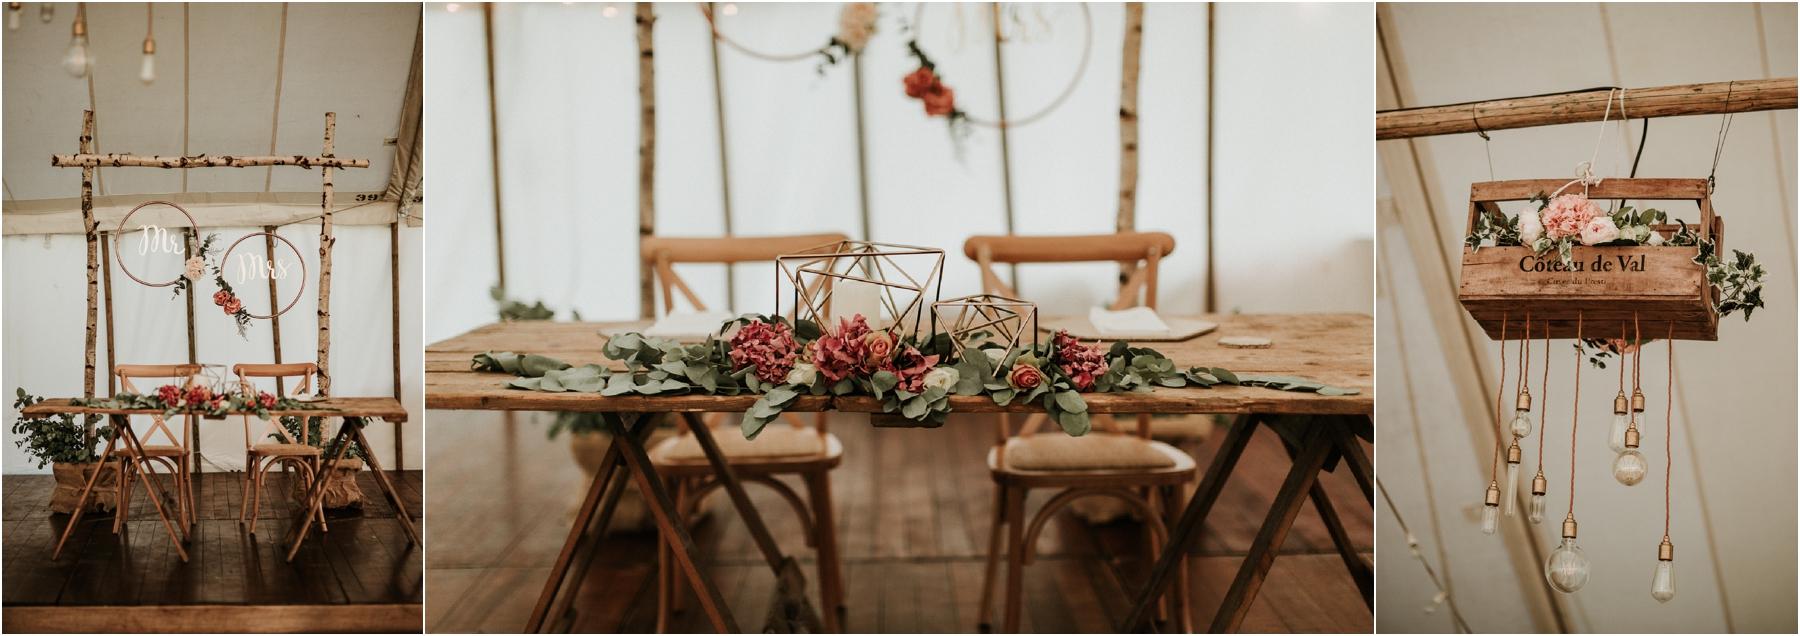 Herefordshire-uk-wedding-photographer_0055.jpg